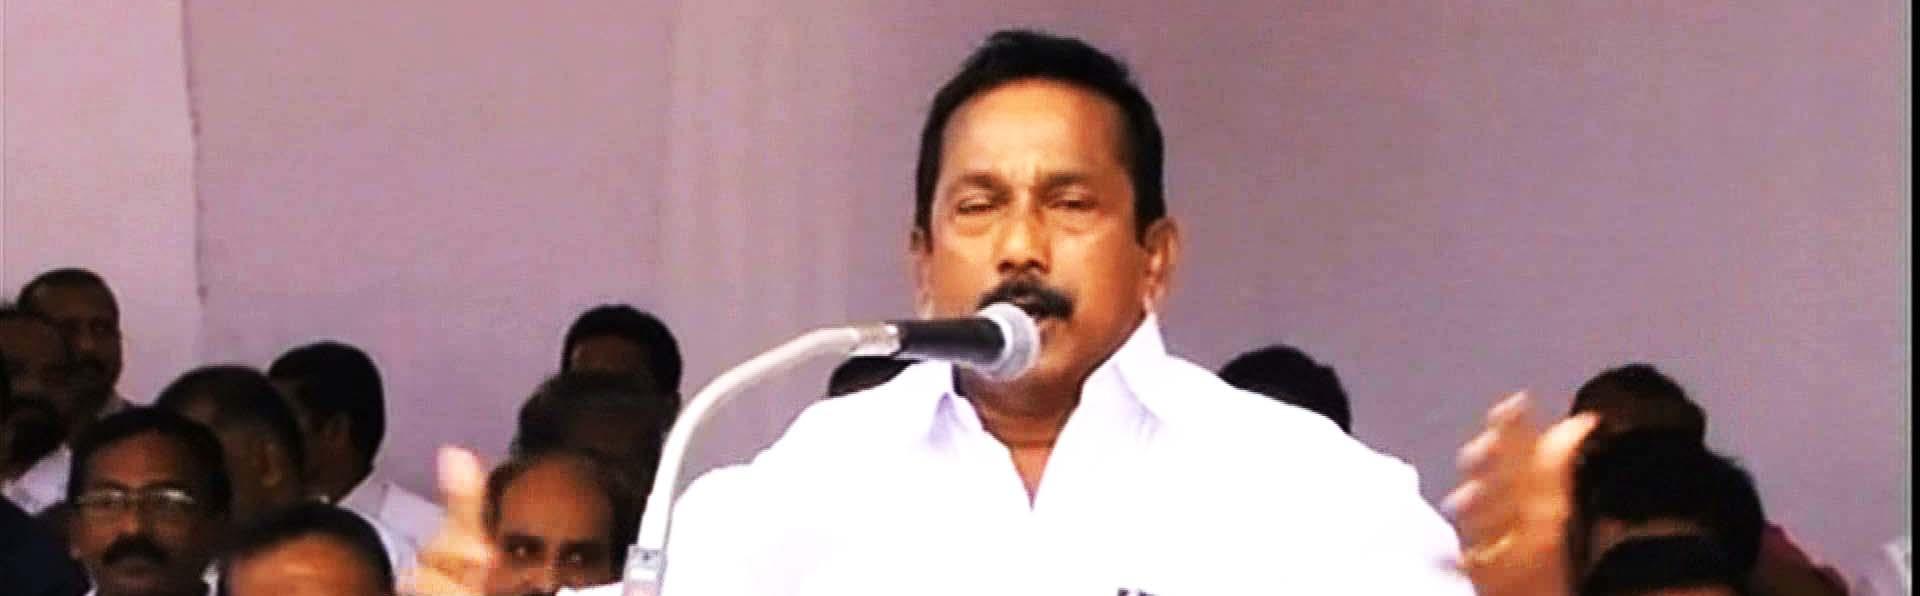 Uzhavoor Vijayan ED 4